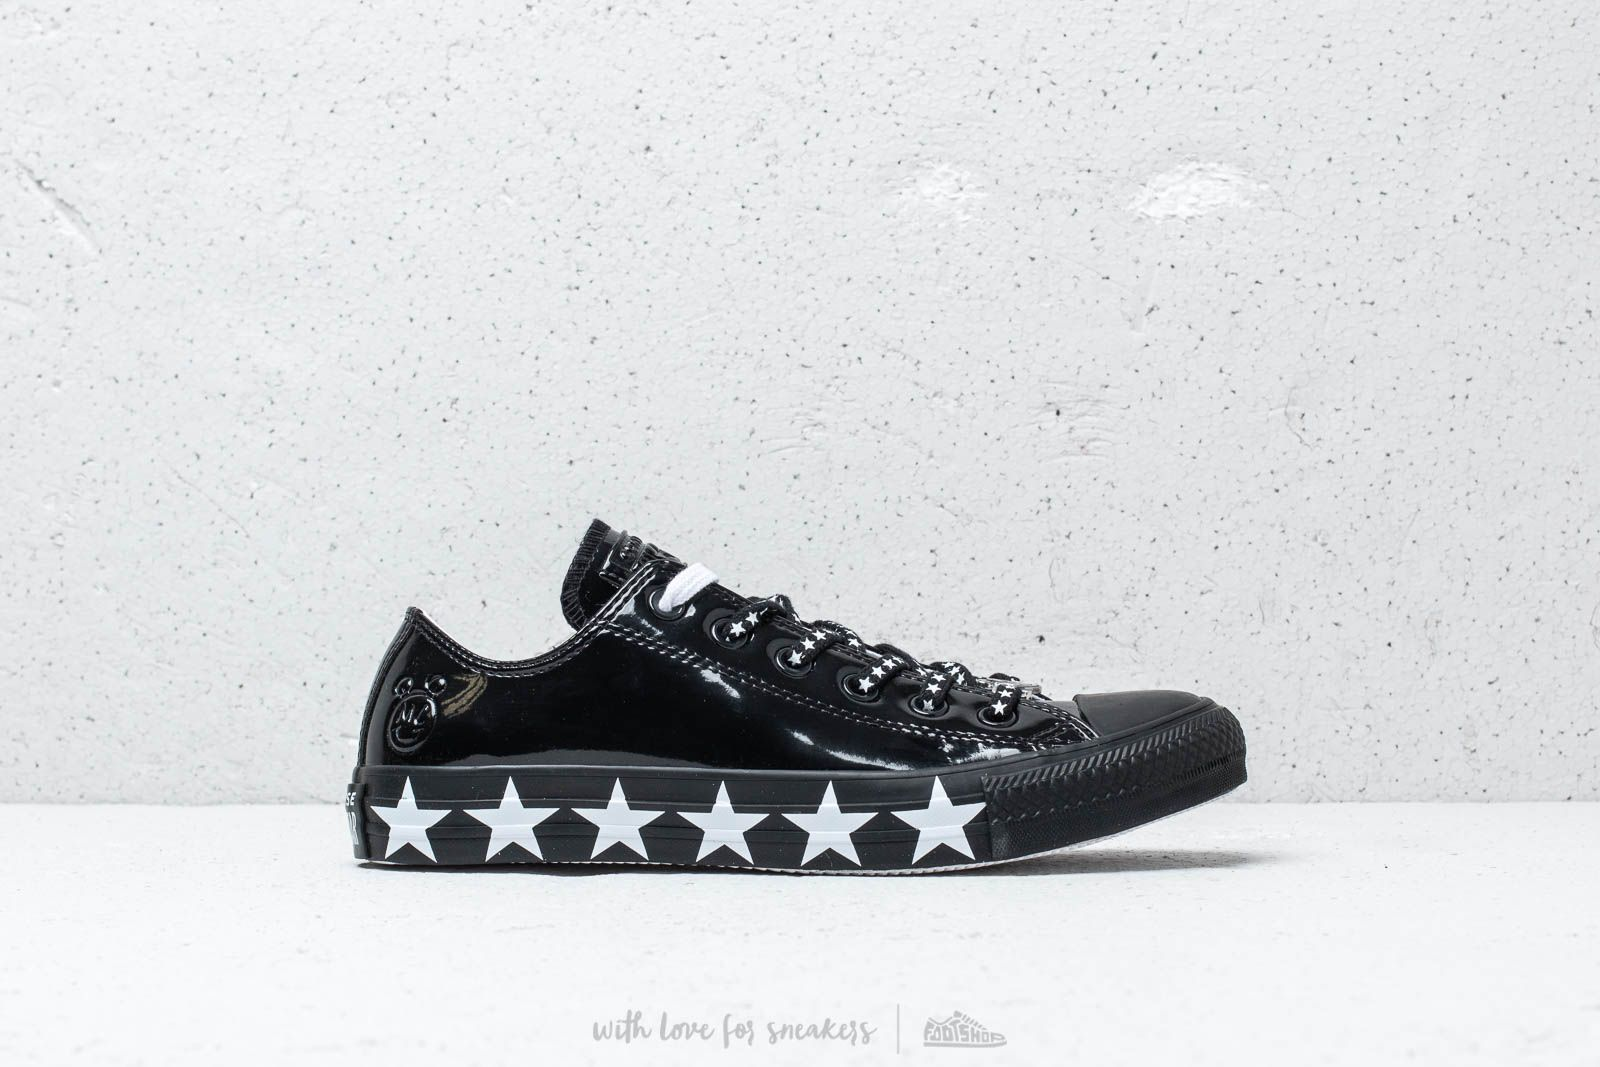 Converse x Miley Cyrus Chuck Taylor All Star OX Black White Black | Footshop